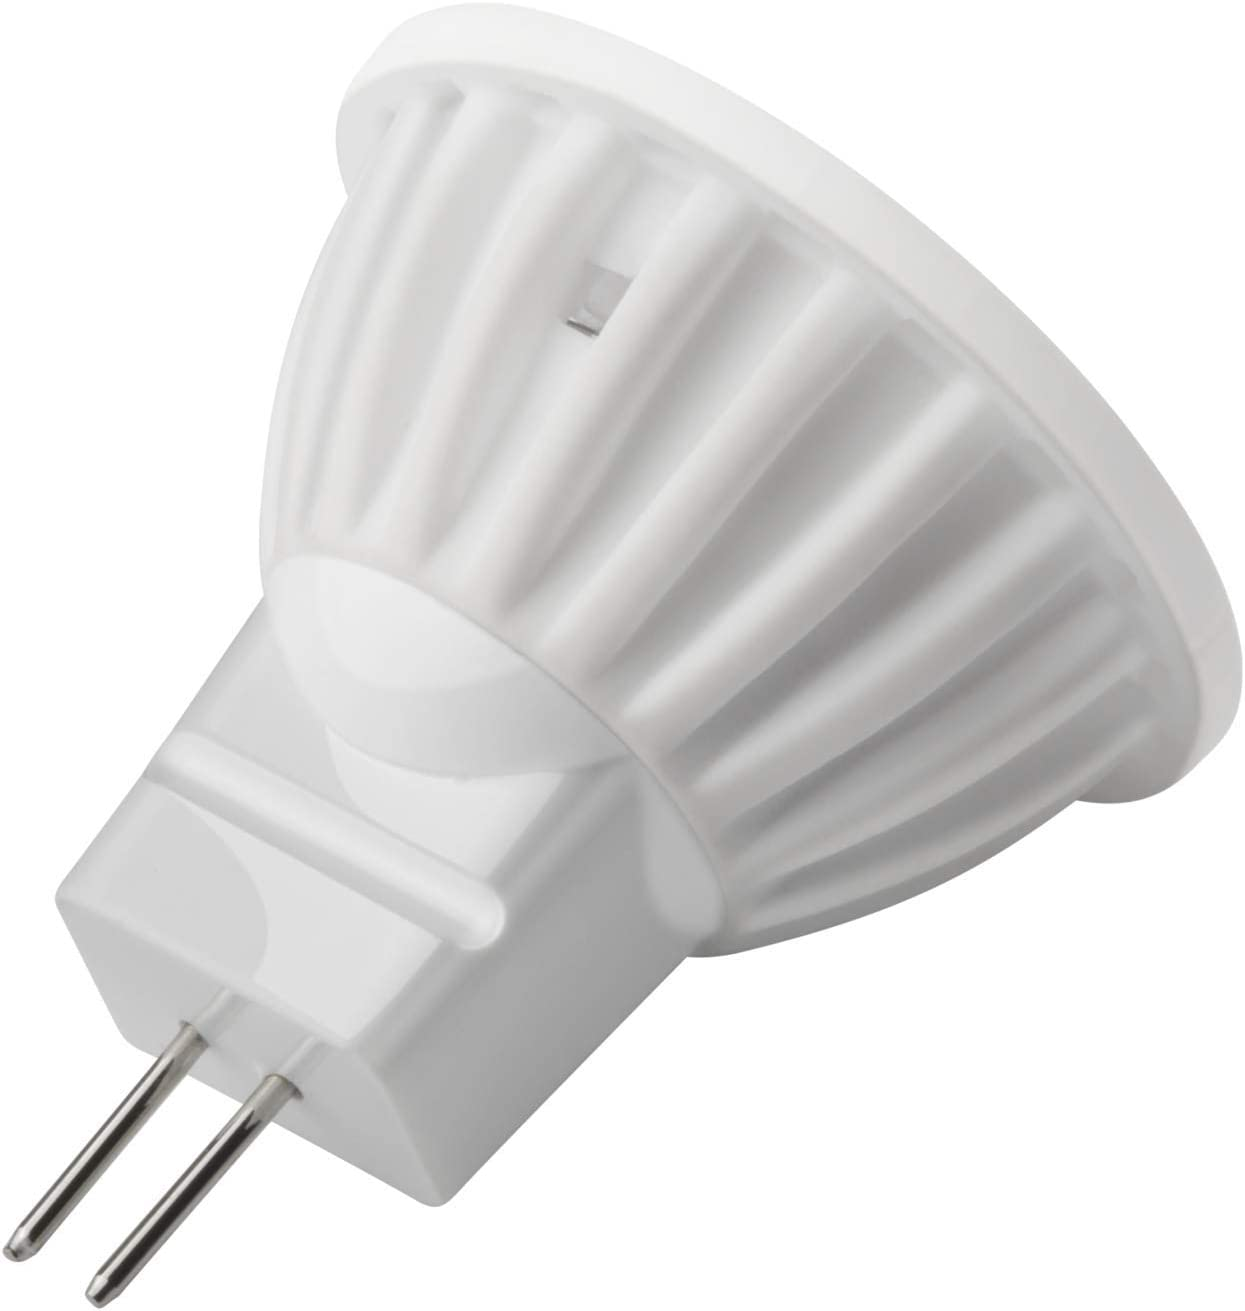 35W Halogen Bulbs Equivalent,White Light 6000K,2 Piece MR11 GU4 LED Bulb 12 Volt,350 Lumen,G4 Bi-Pin Base,45/° Beam Angle